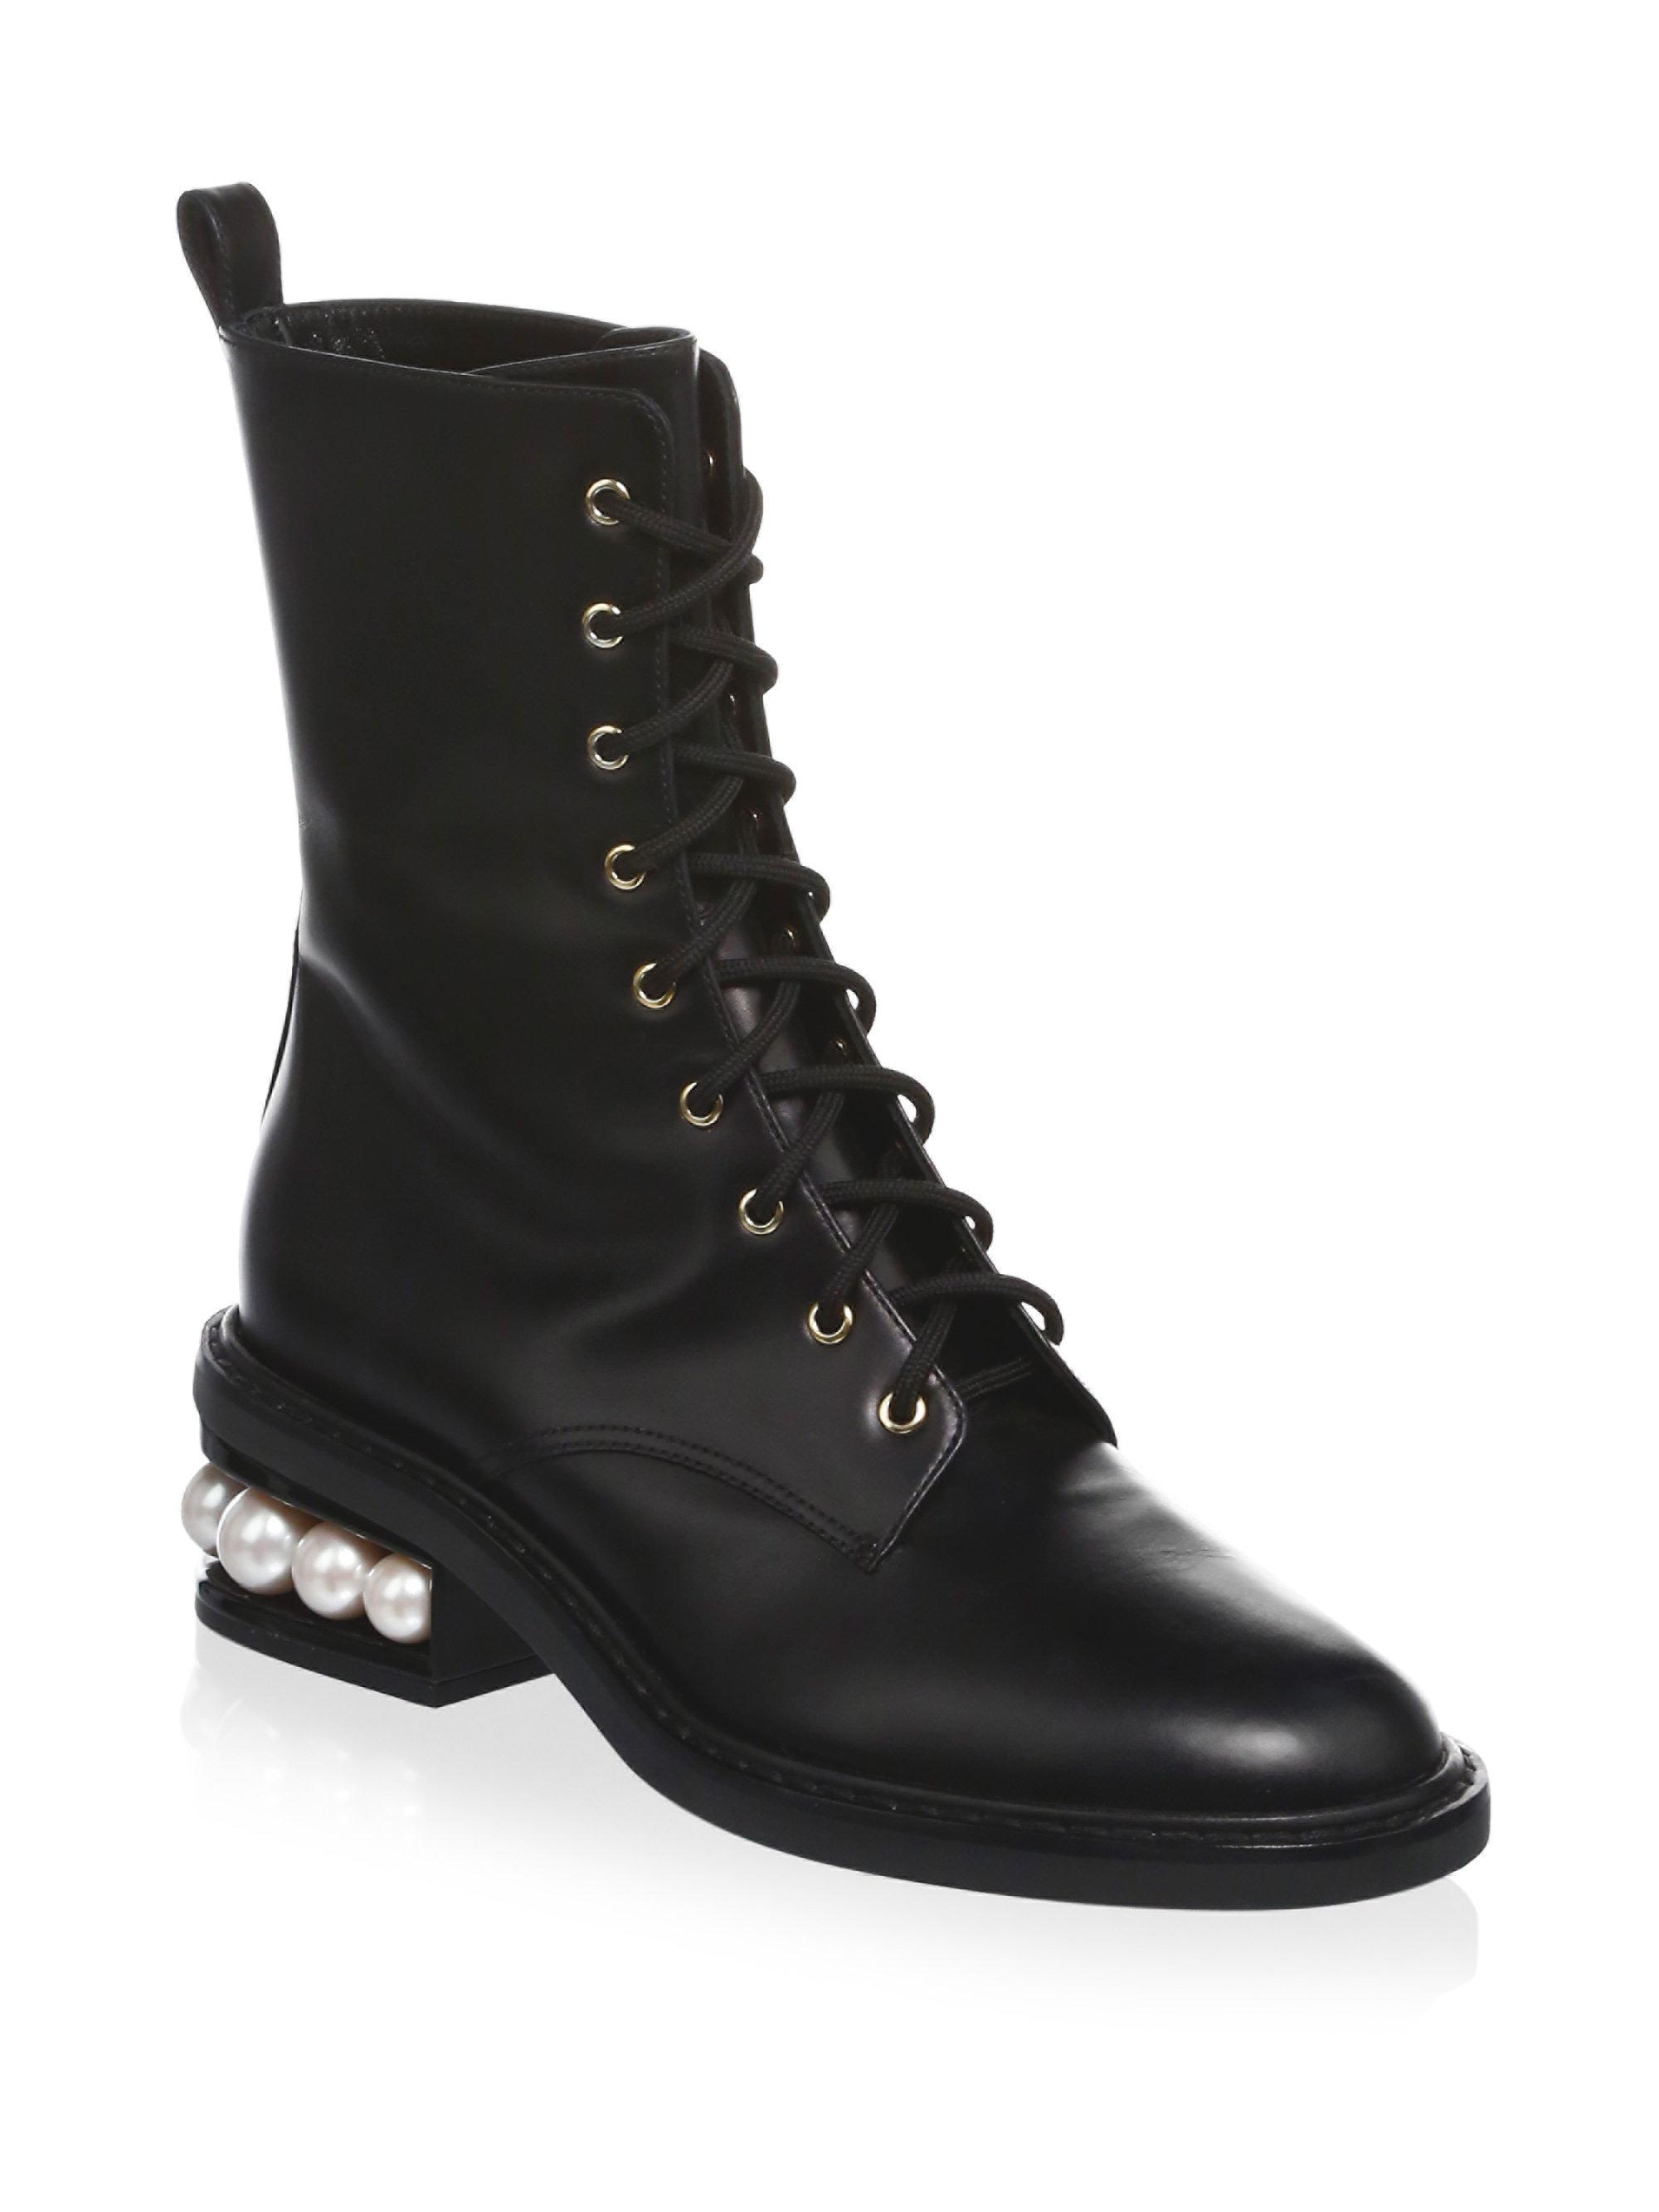 Nicholas Kirkwood Black & Gunmetal Lola Pearl Sock Pump Boots Jeu Des Achats En Ligne RFiK14W